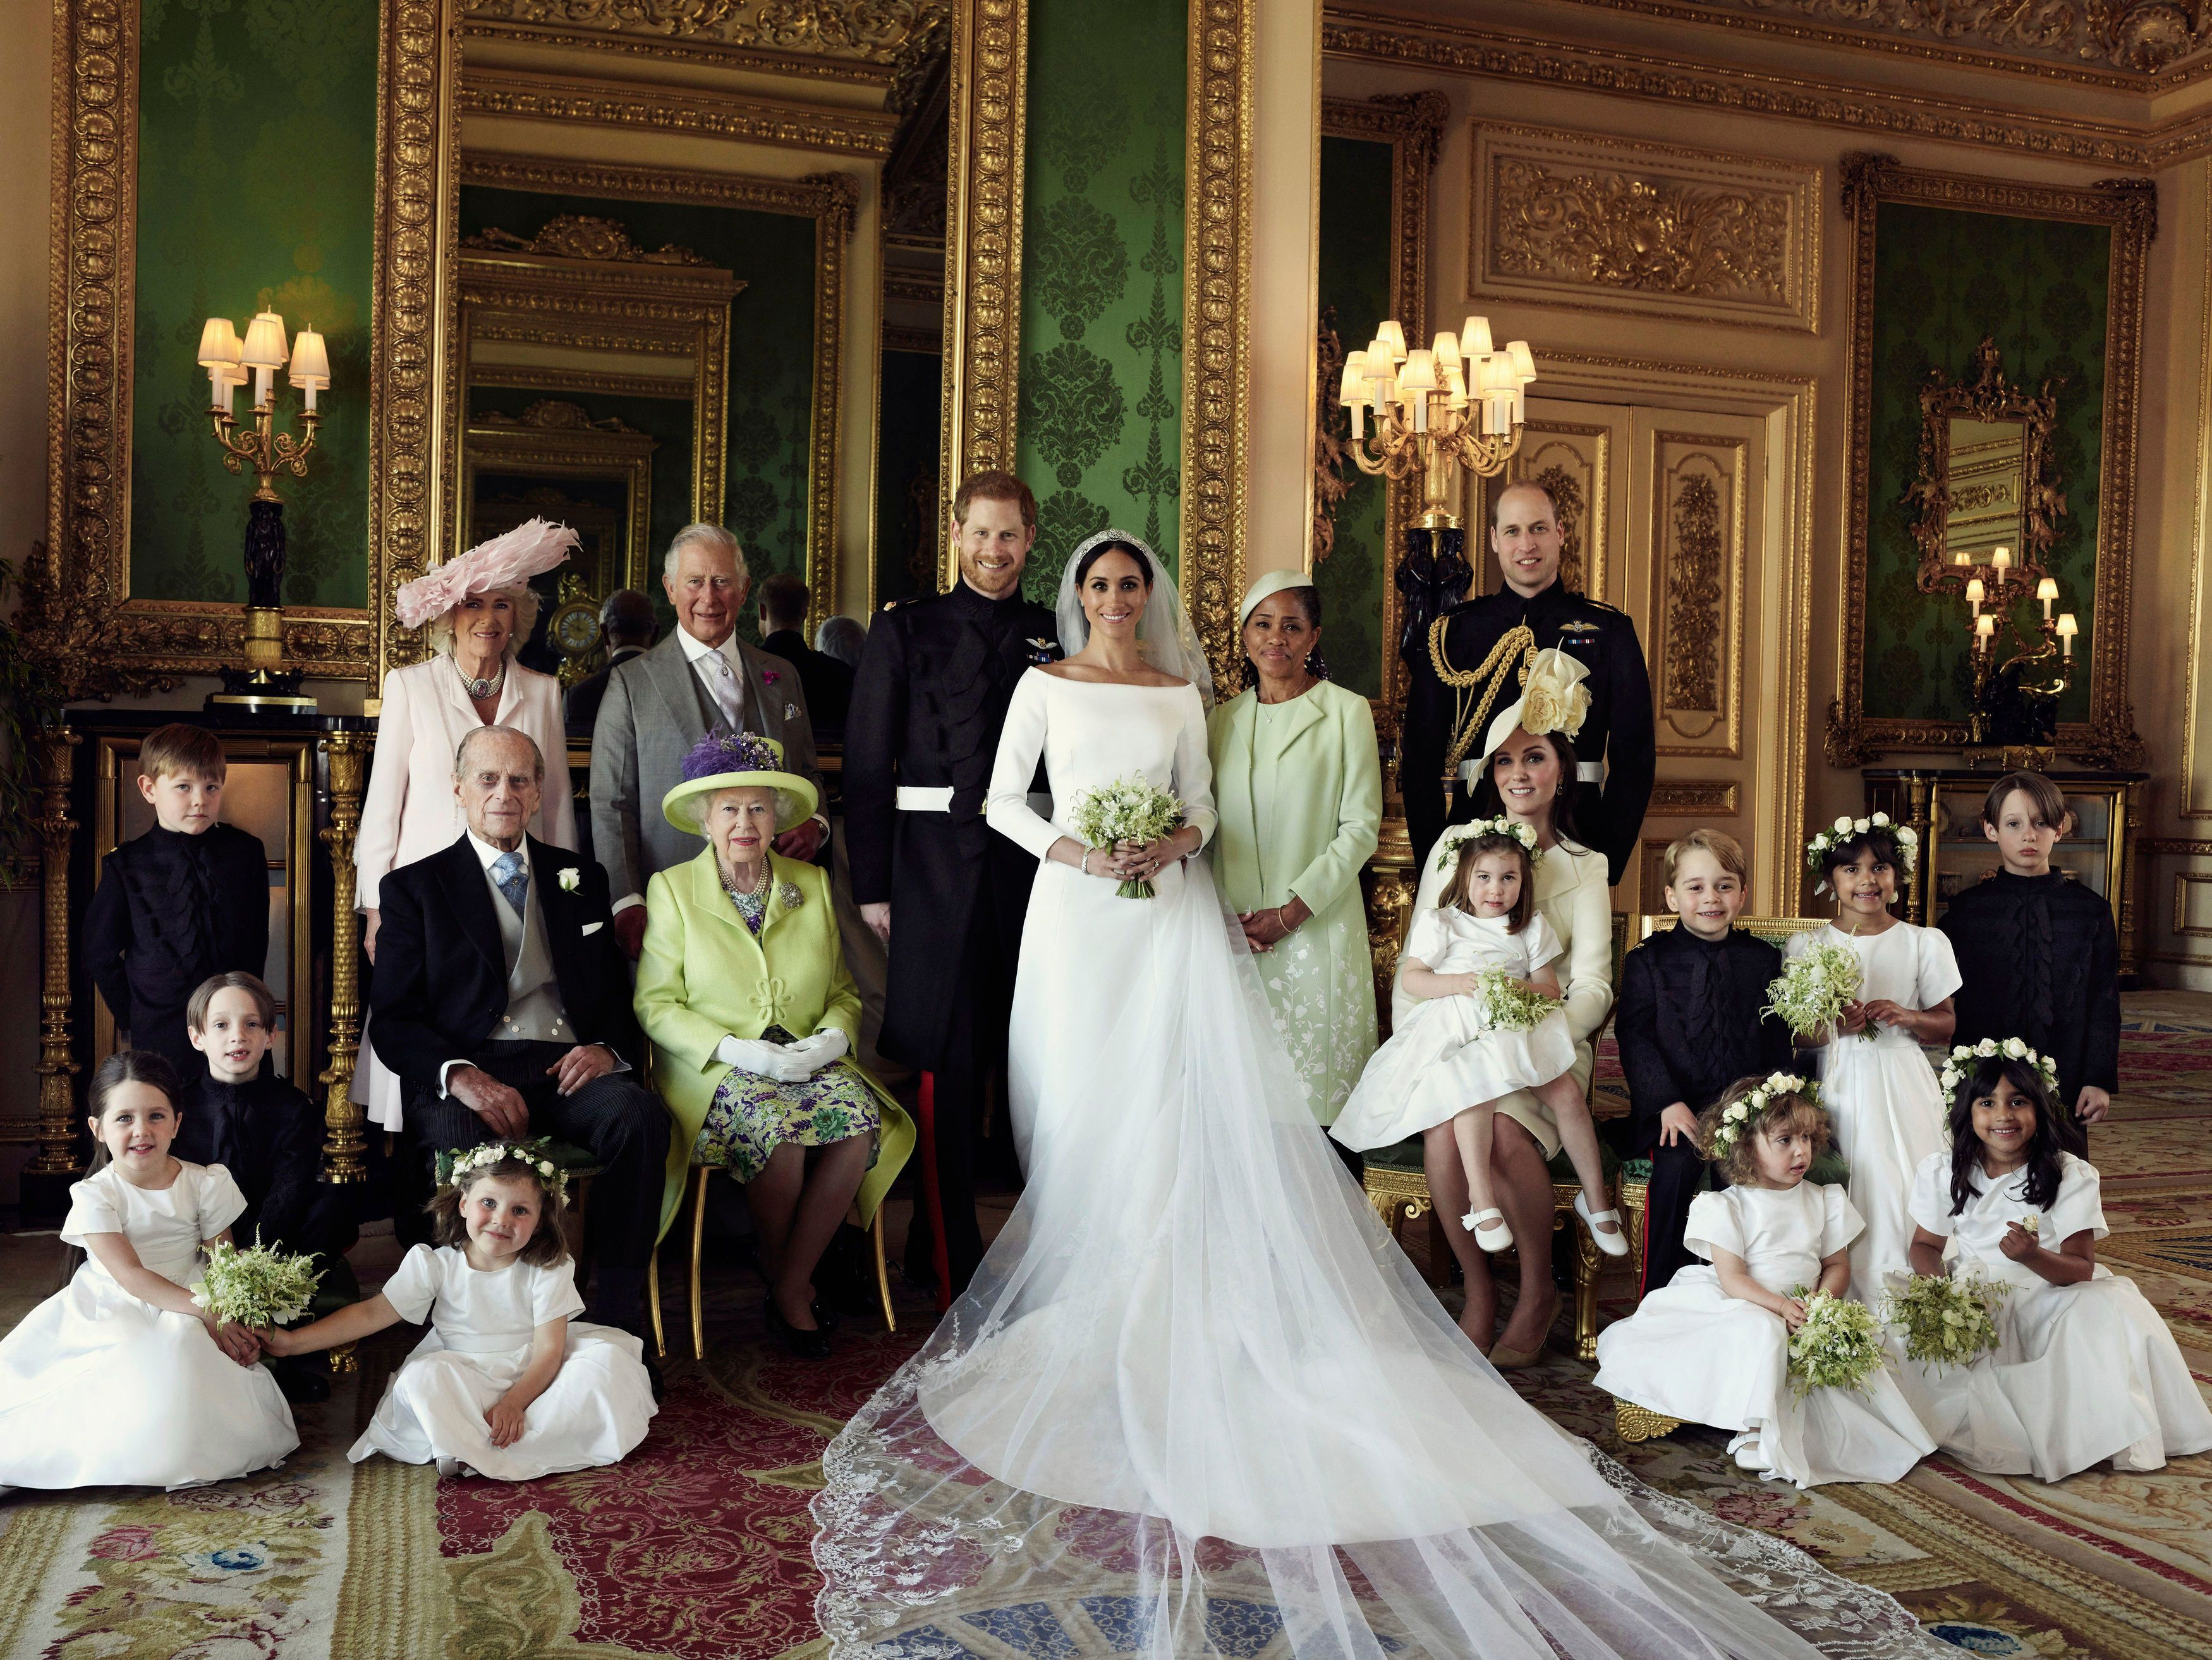 royal wedding portraits